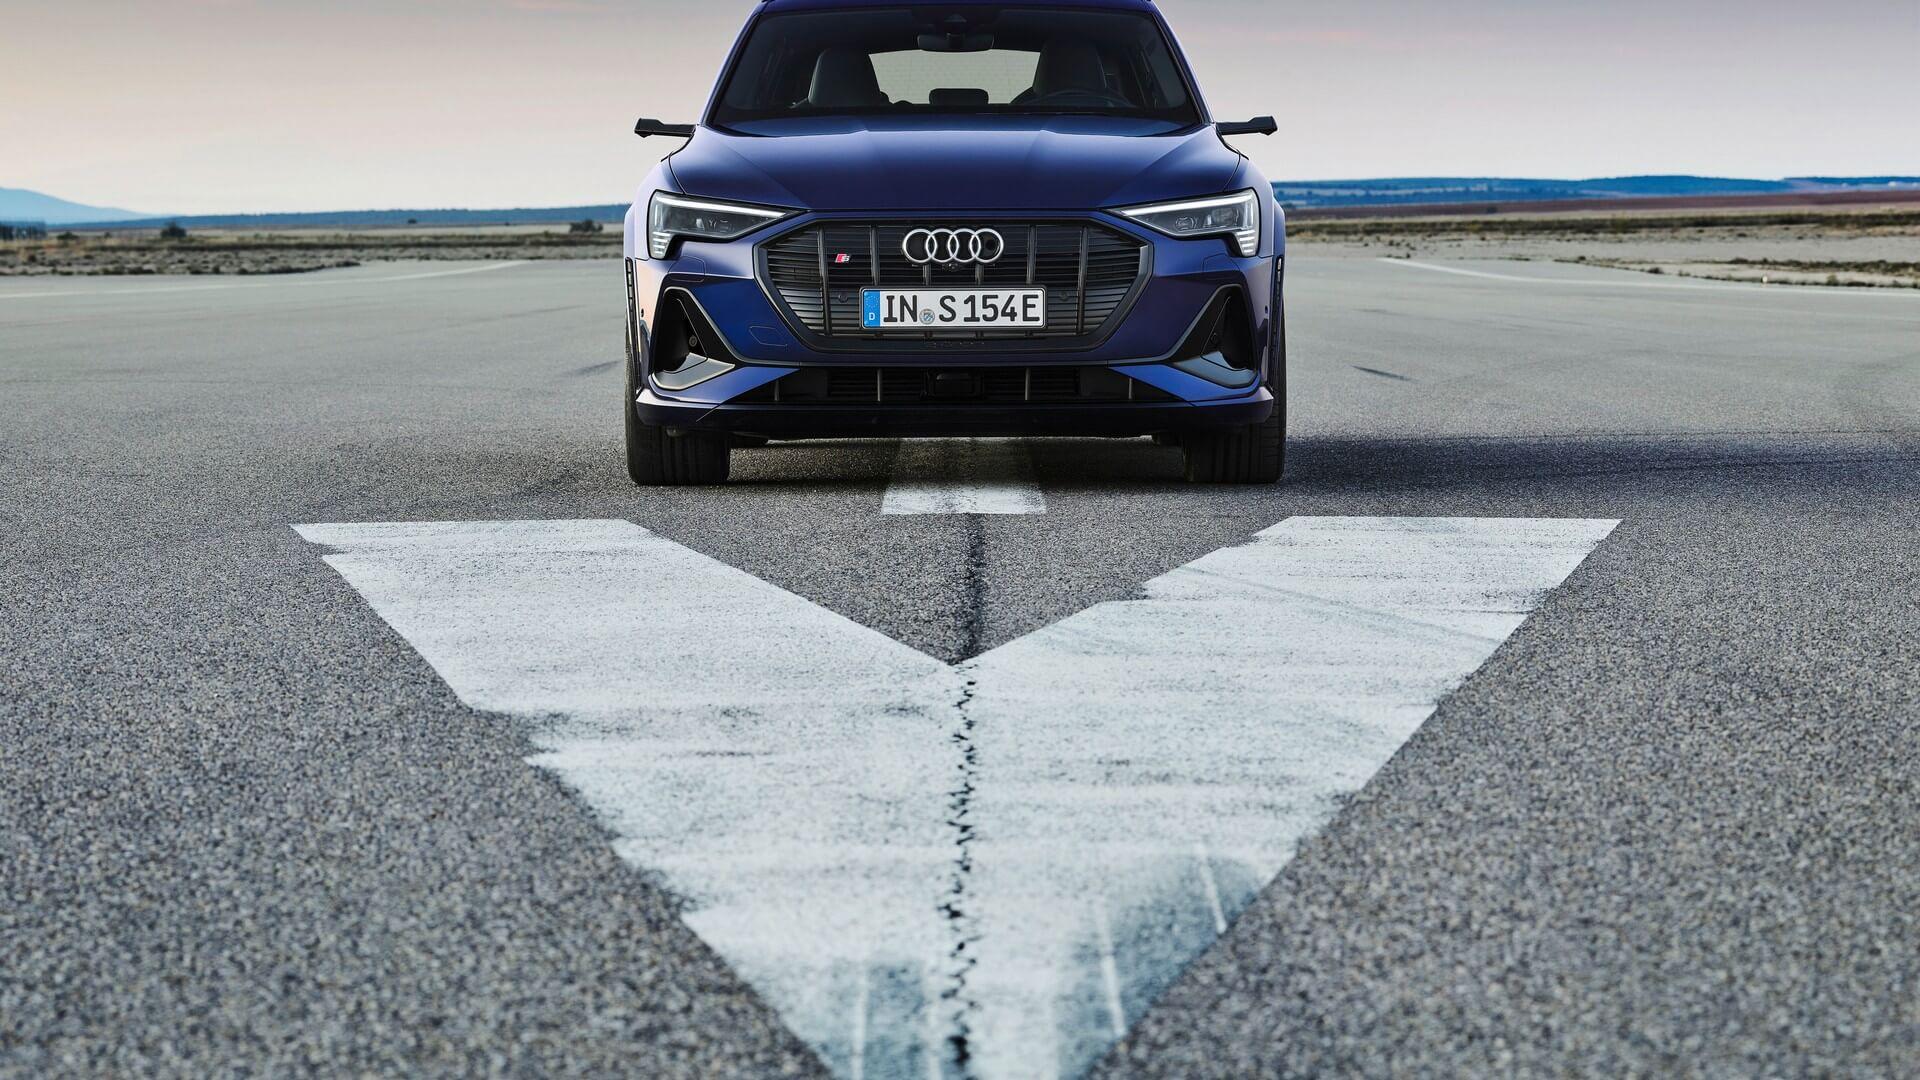 Audi-E-Tron-S-and-E-Tron-S-Sportback-2020-37